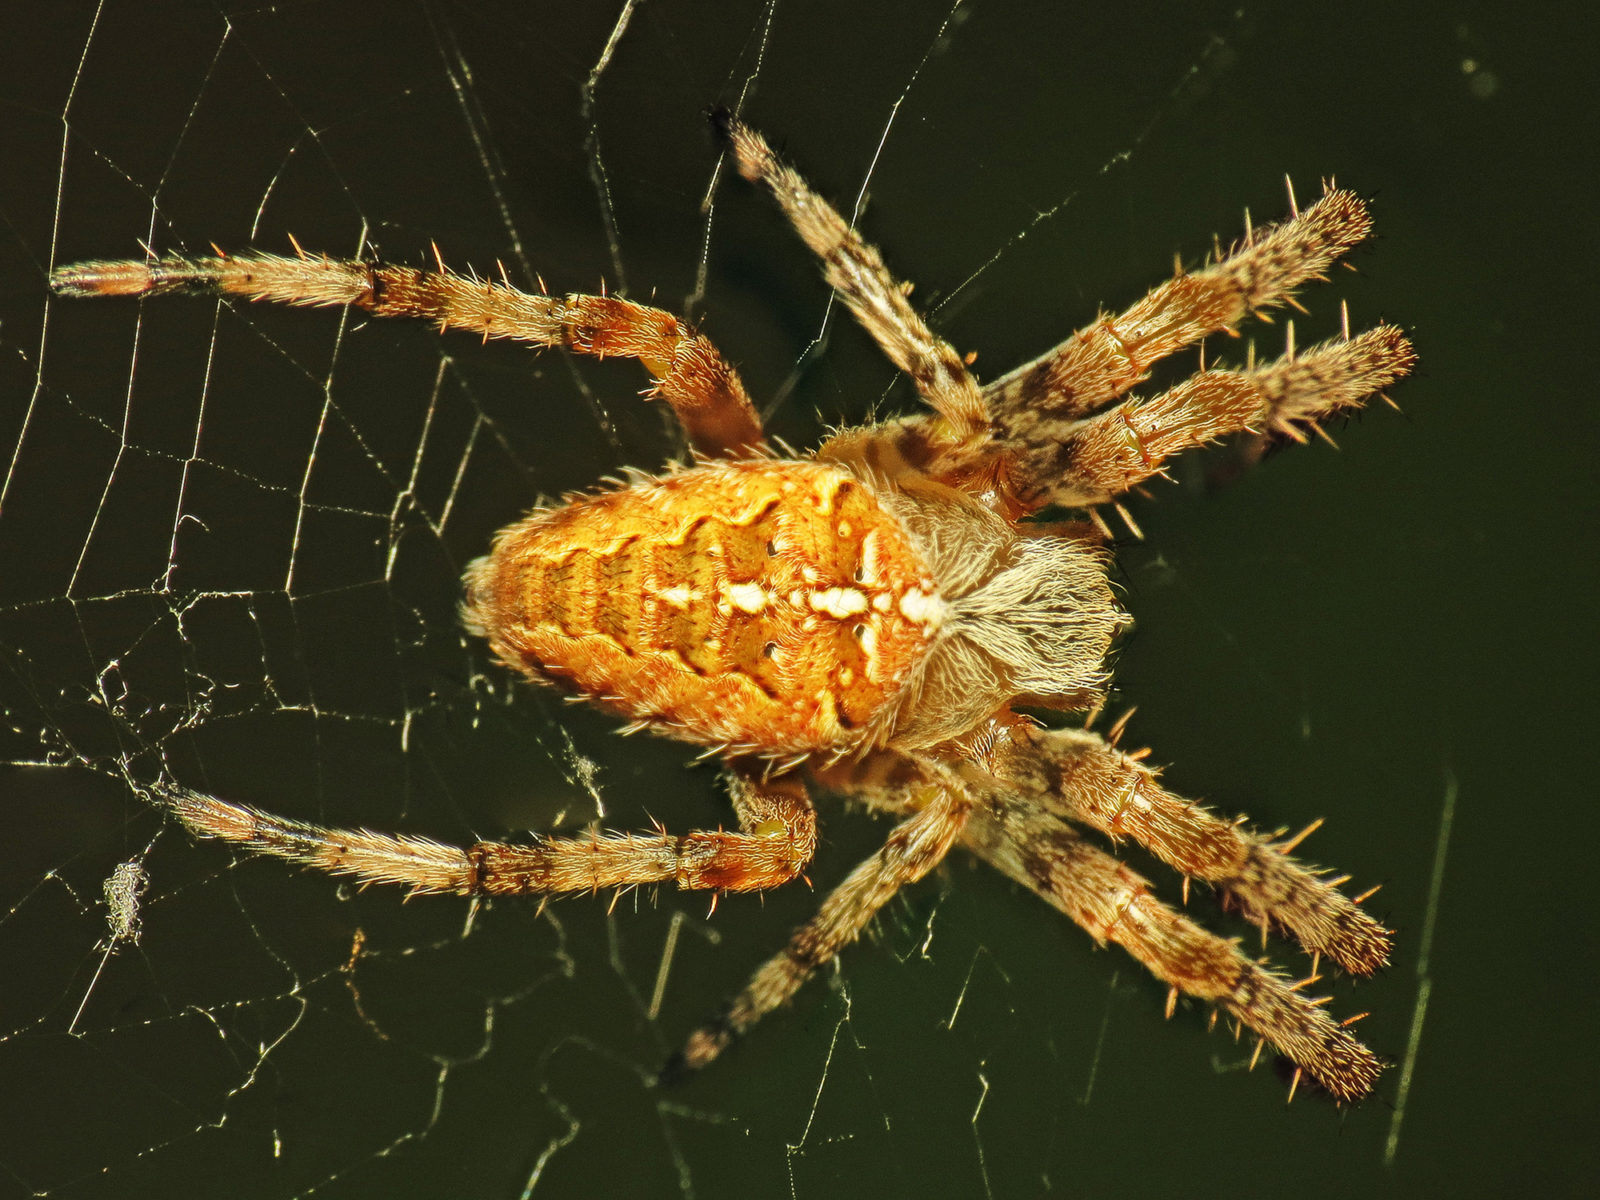 I wonder what big black spiders dream about